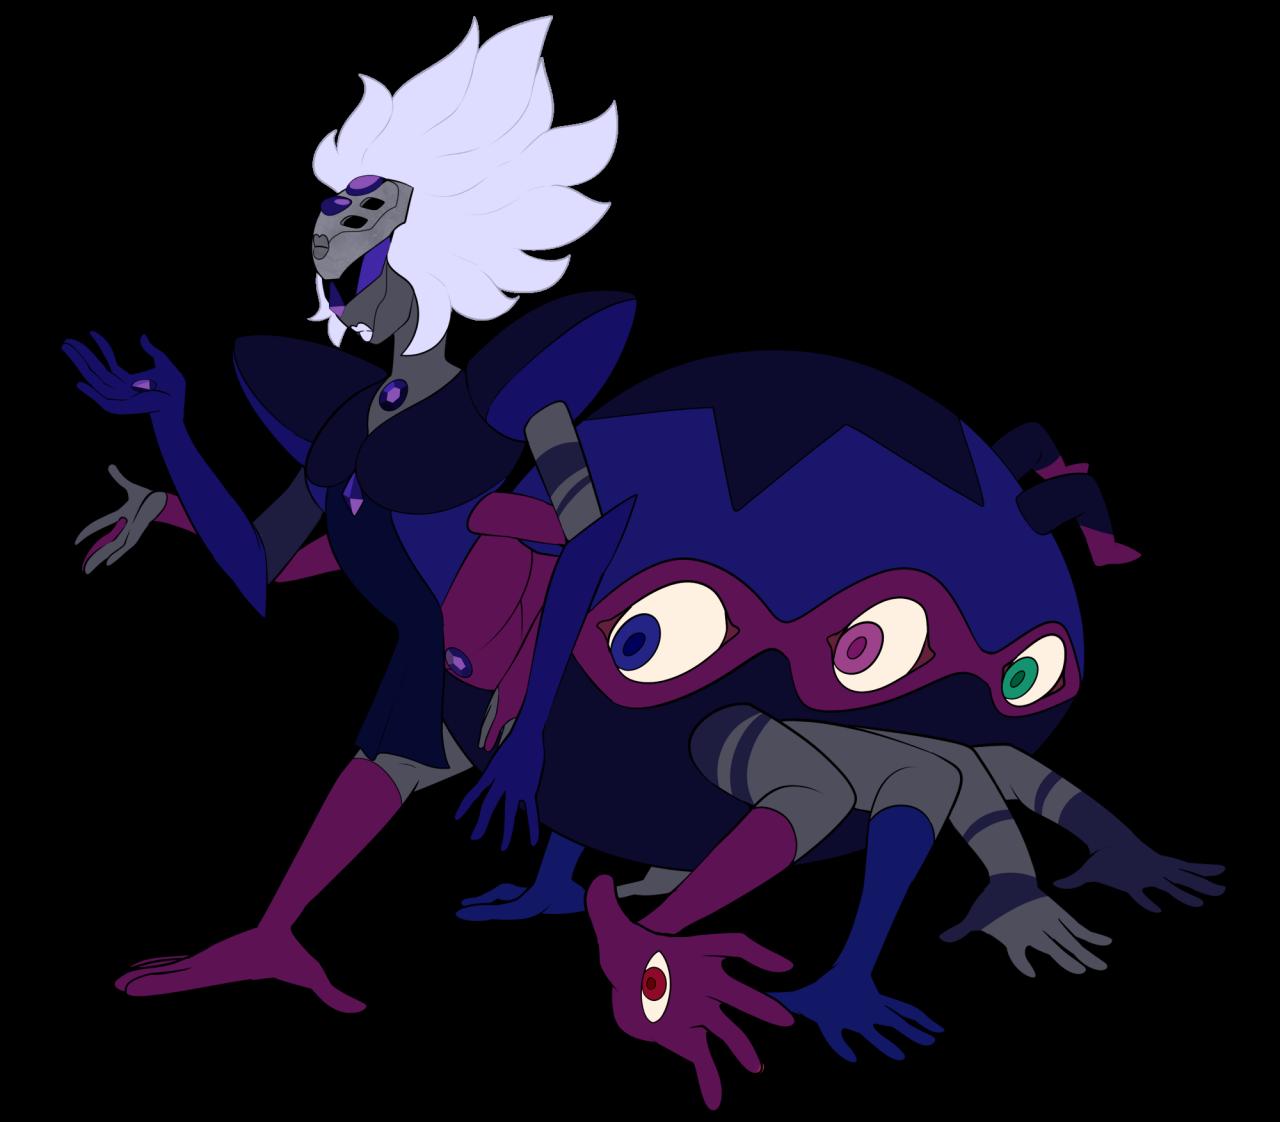 Steven Universe, Garnet, Amethyst, Pearl, Lapis Lazuli, Jasper, _, & Peridot